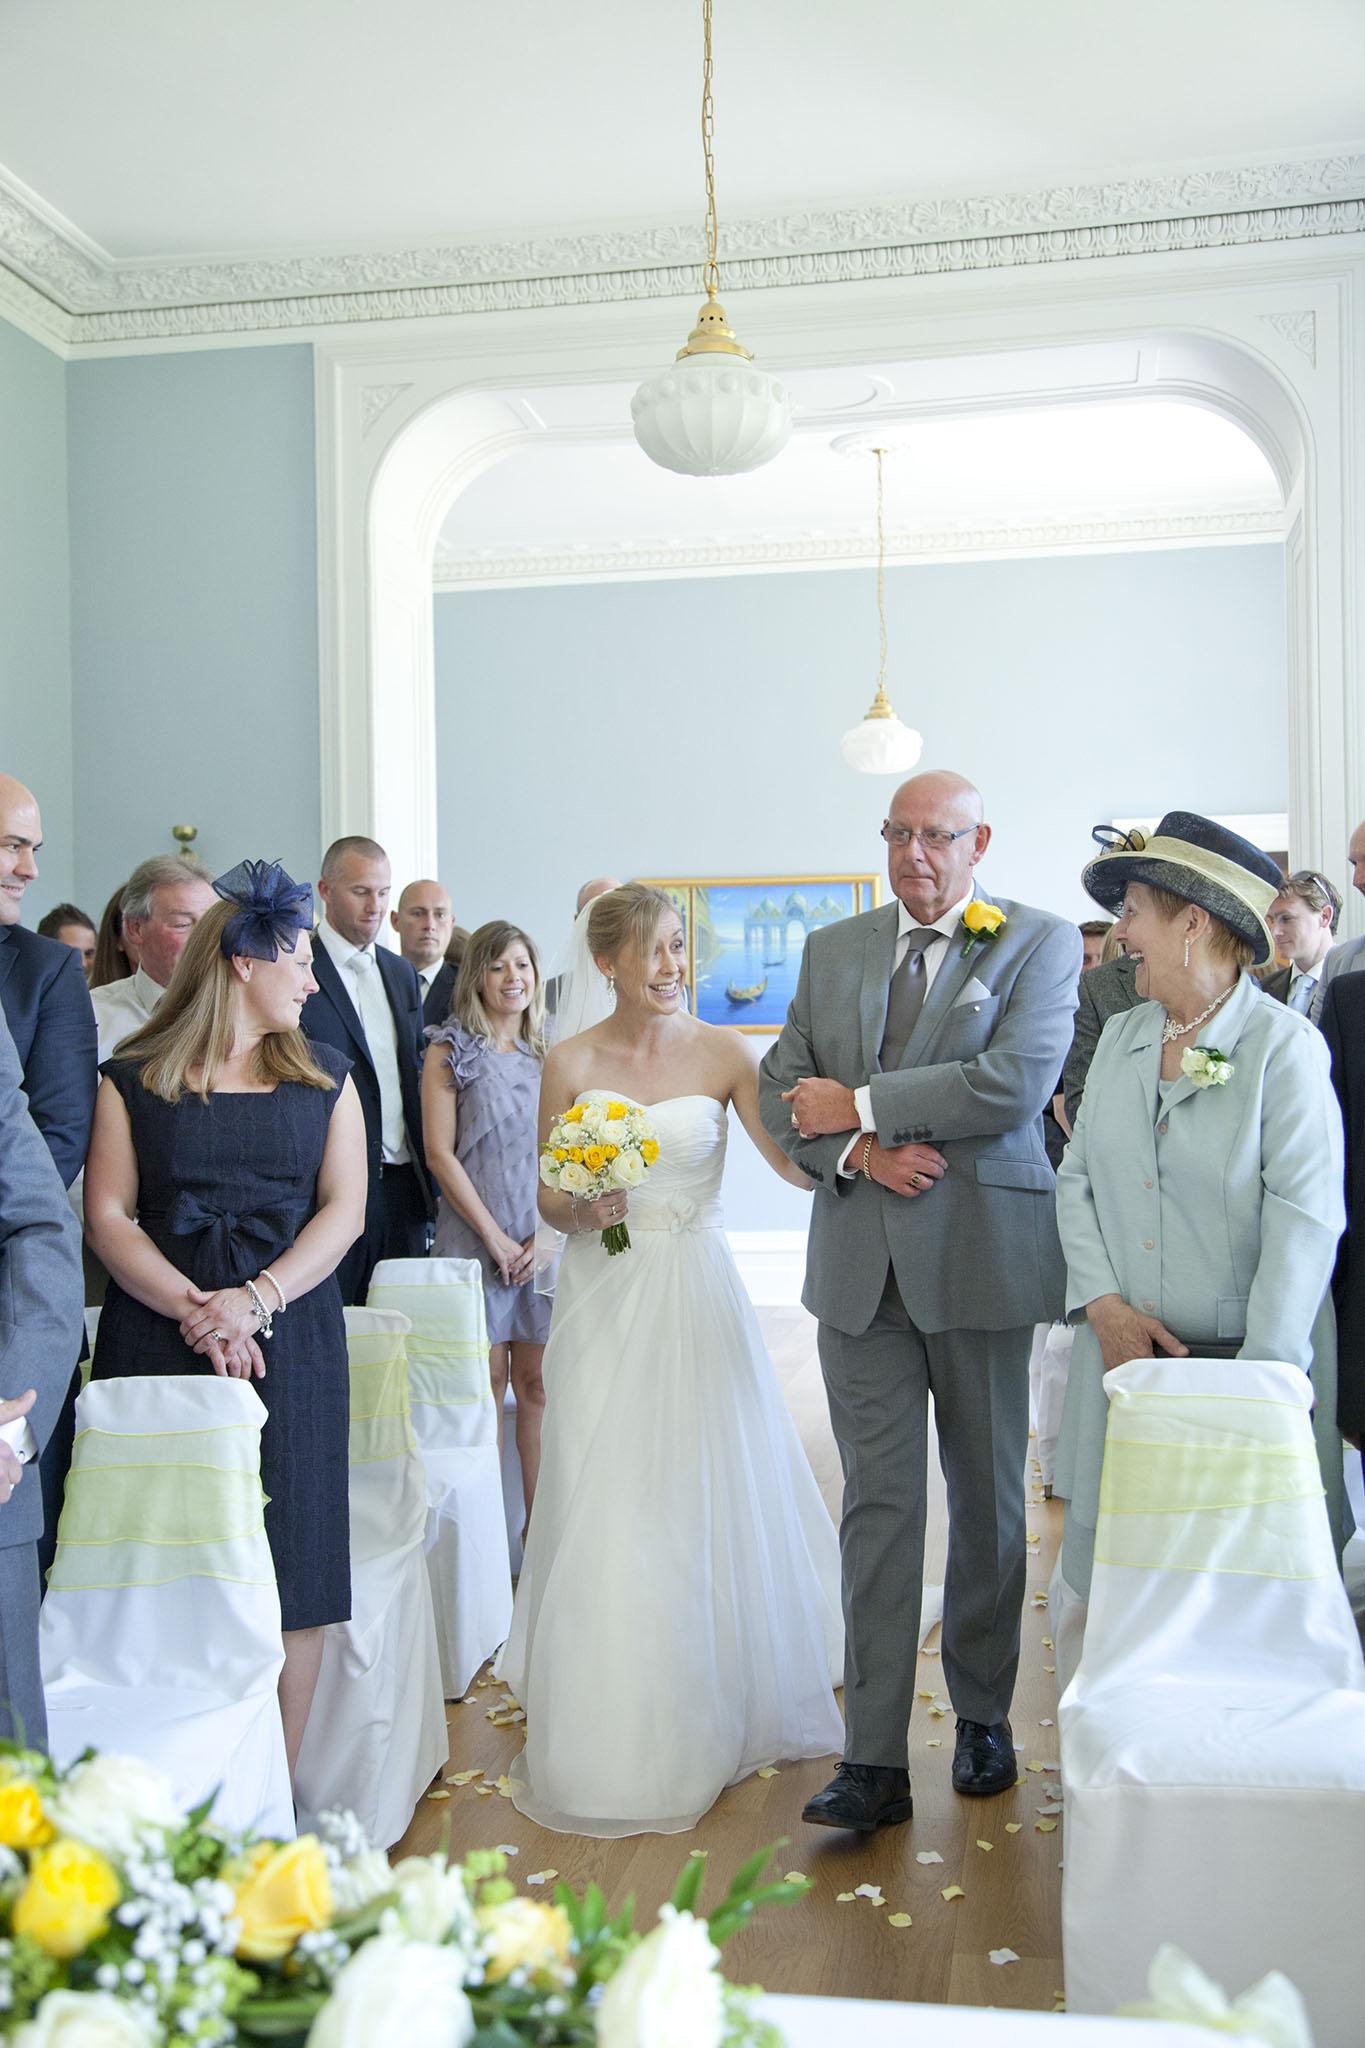 elizabethg_fineart_photography_hertfordshire_rachel_adam_wedding_highelmsmanor_18.jpg